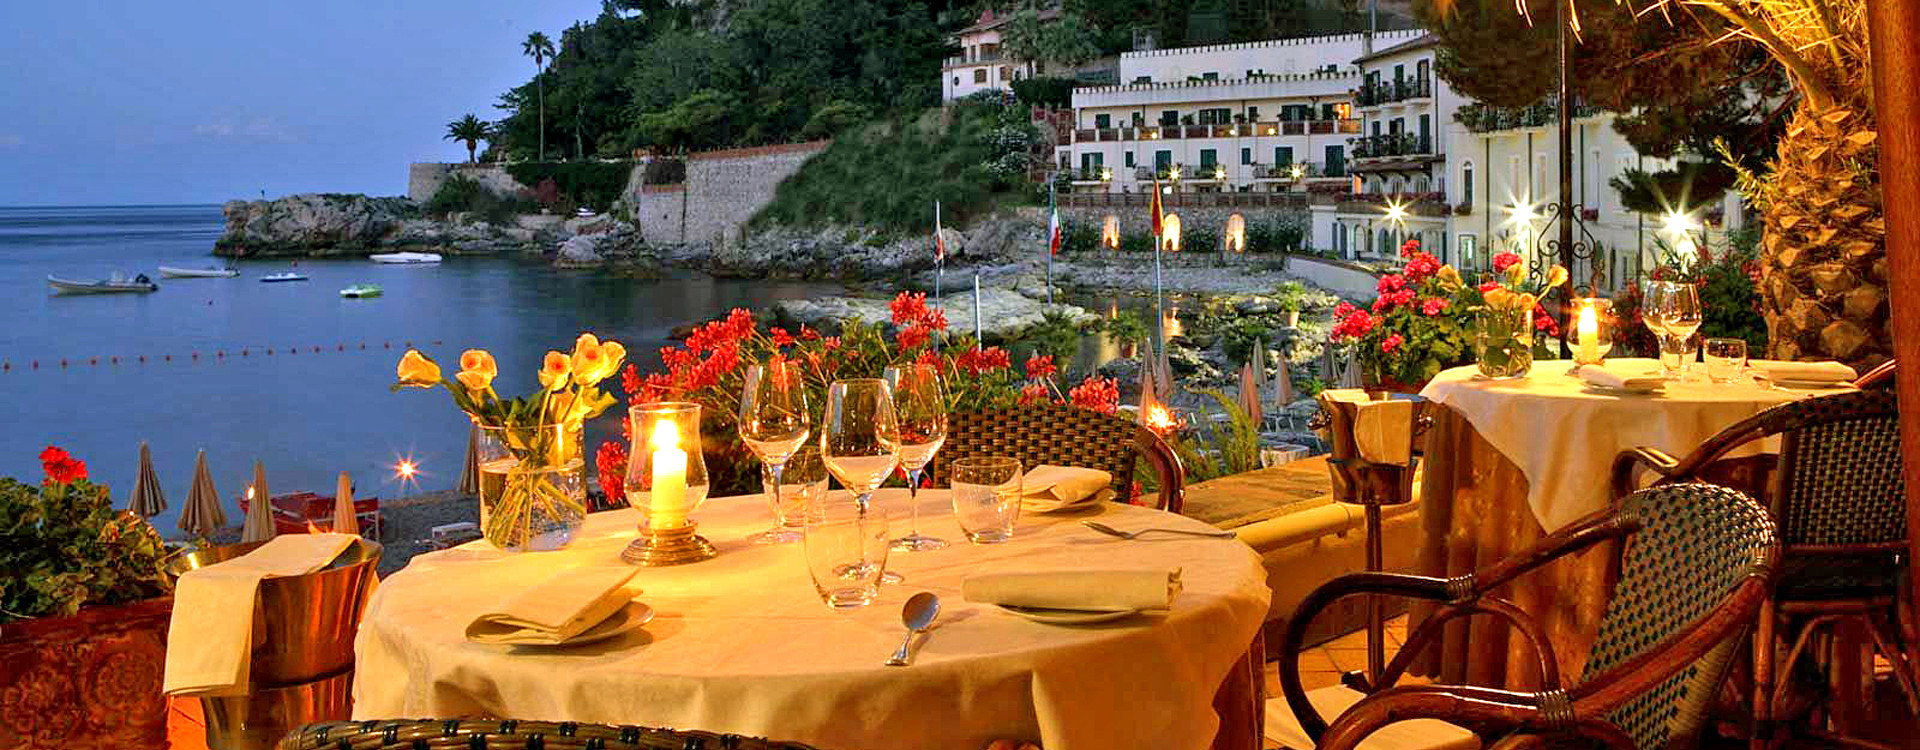 Ресторан в Belmond Villa St Andrea